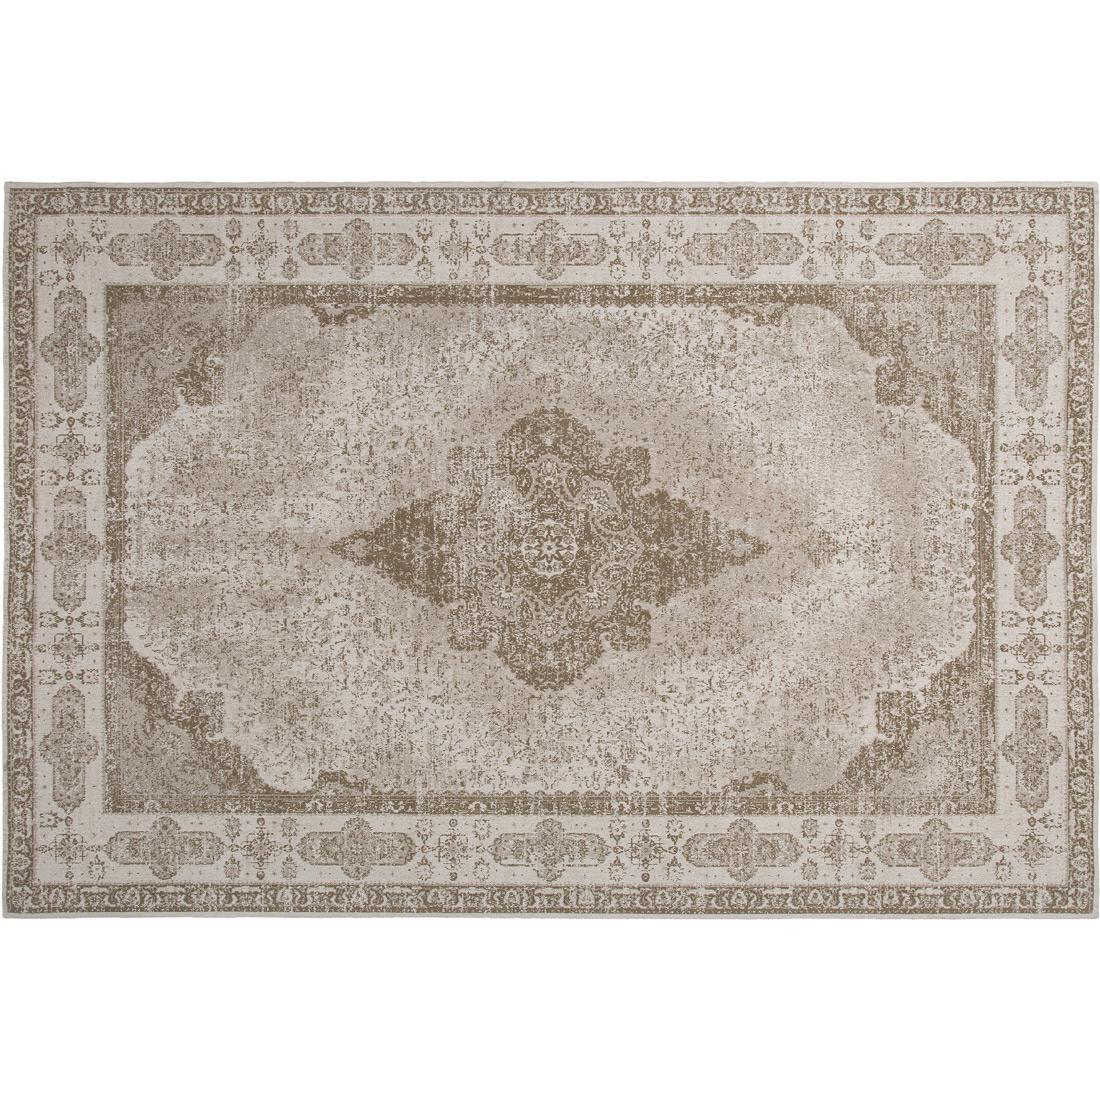 Vloerkleed Xilento Design Sand | 160 x 230 cm